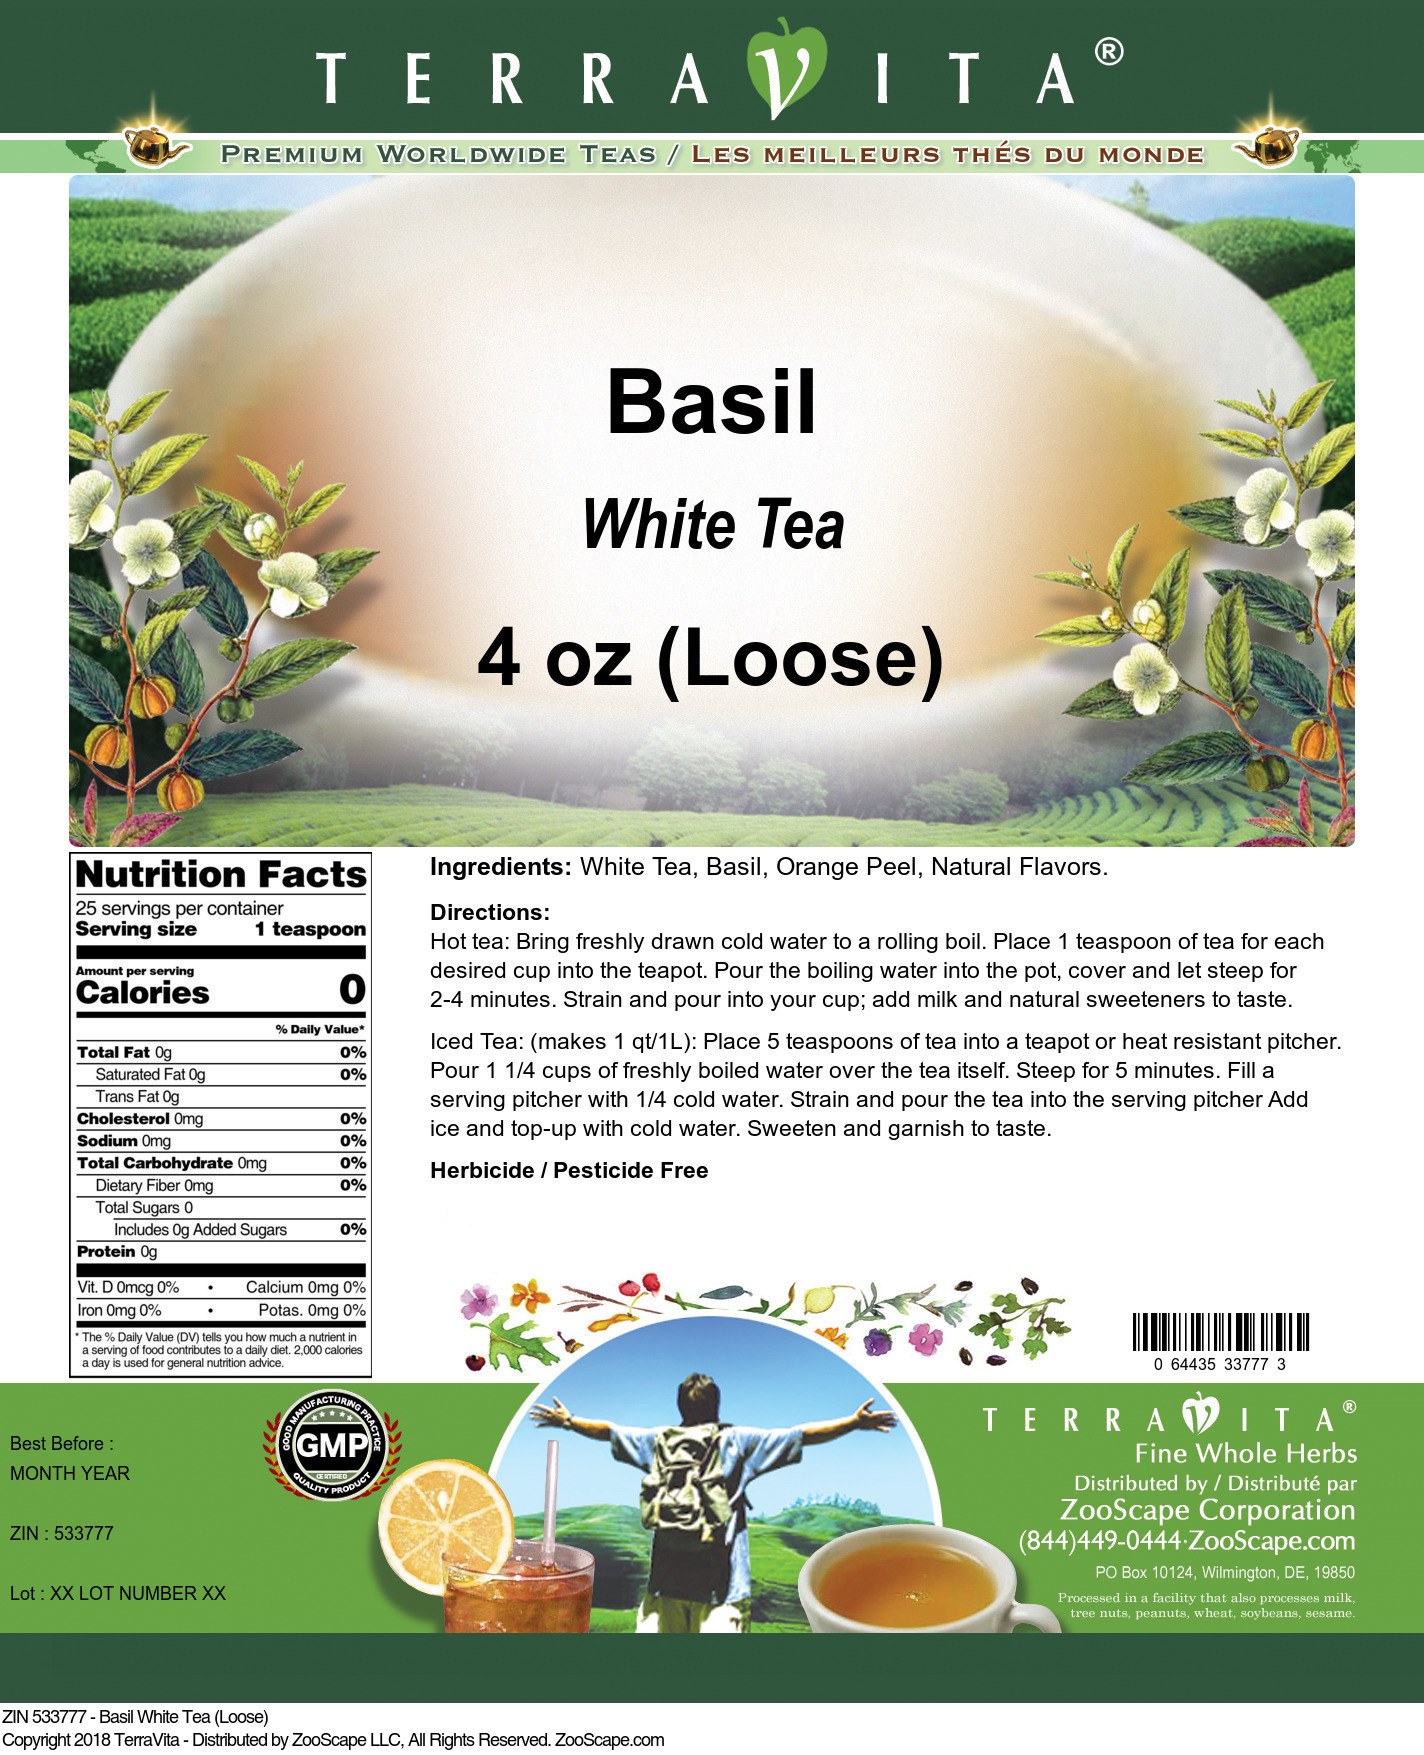 Basil White Tea (Loose)